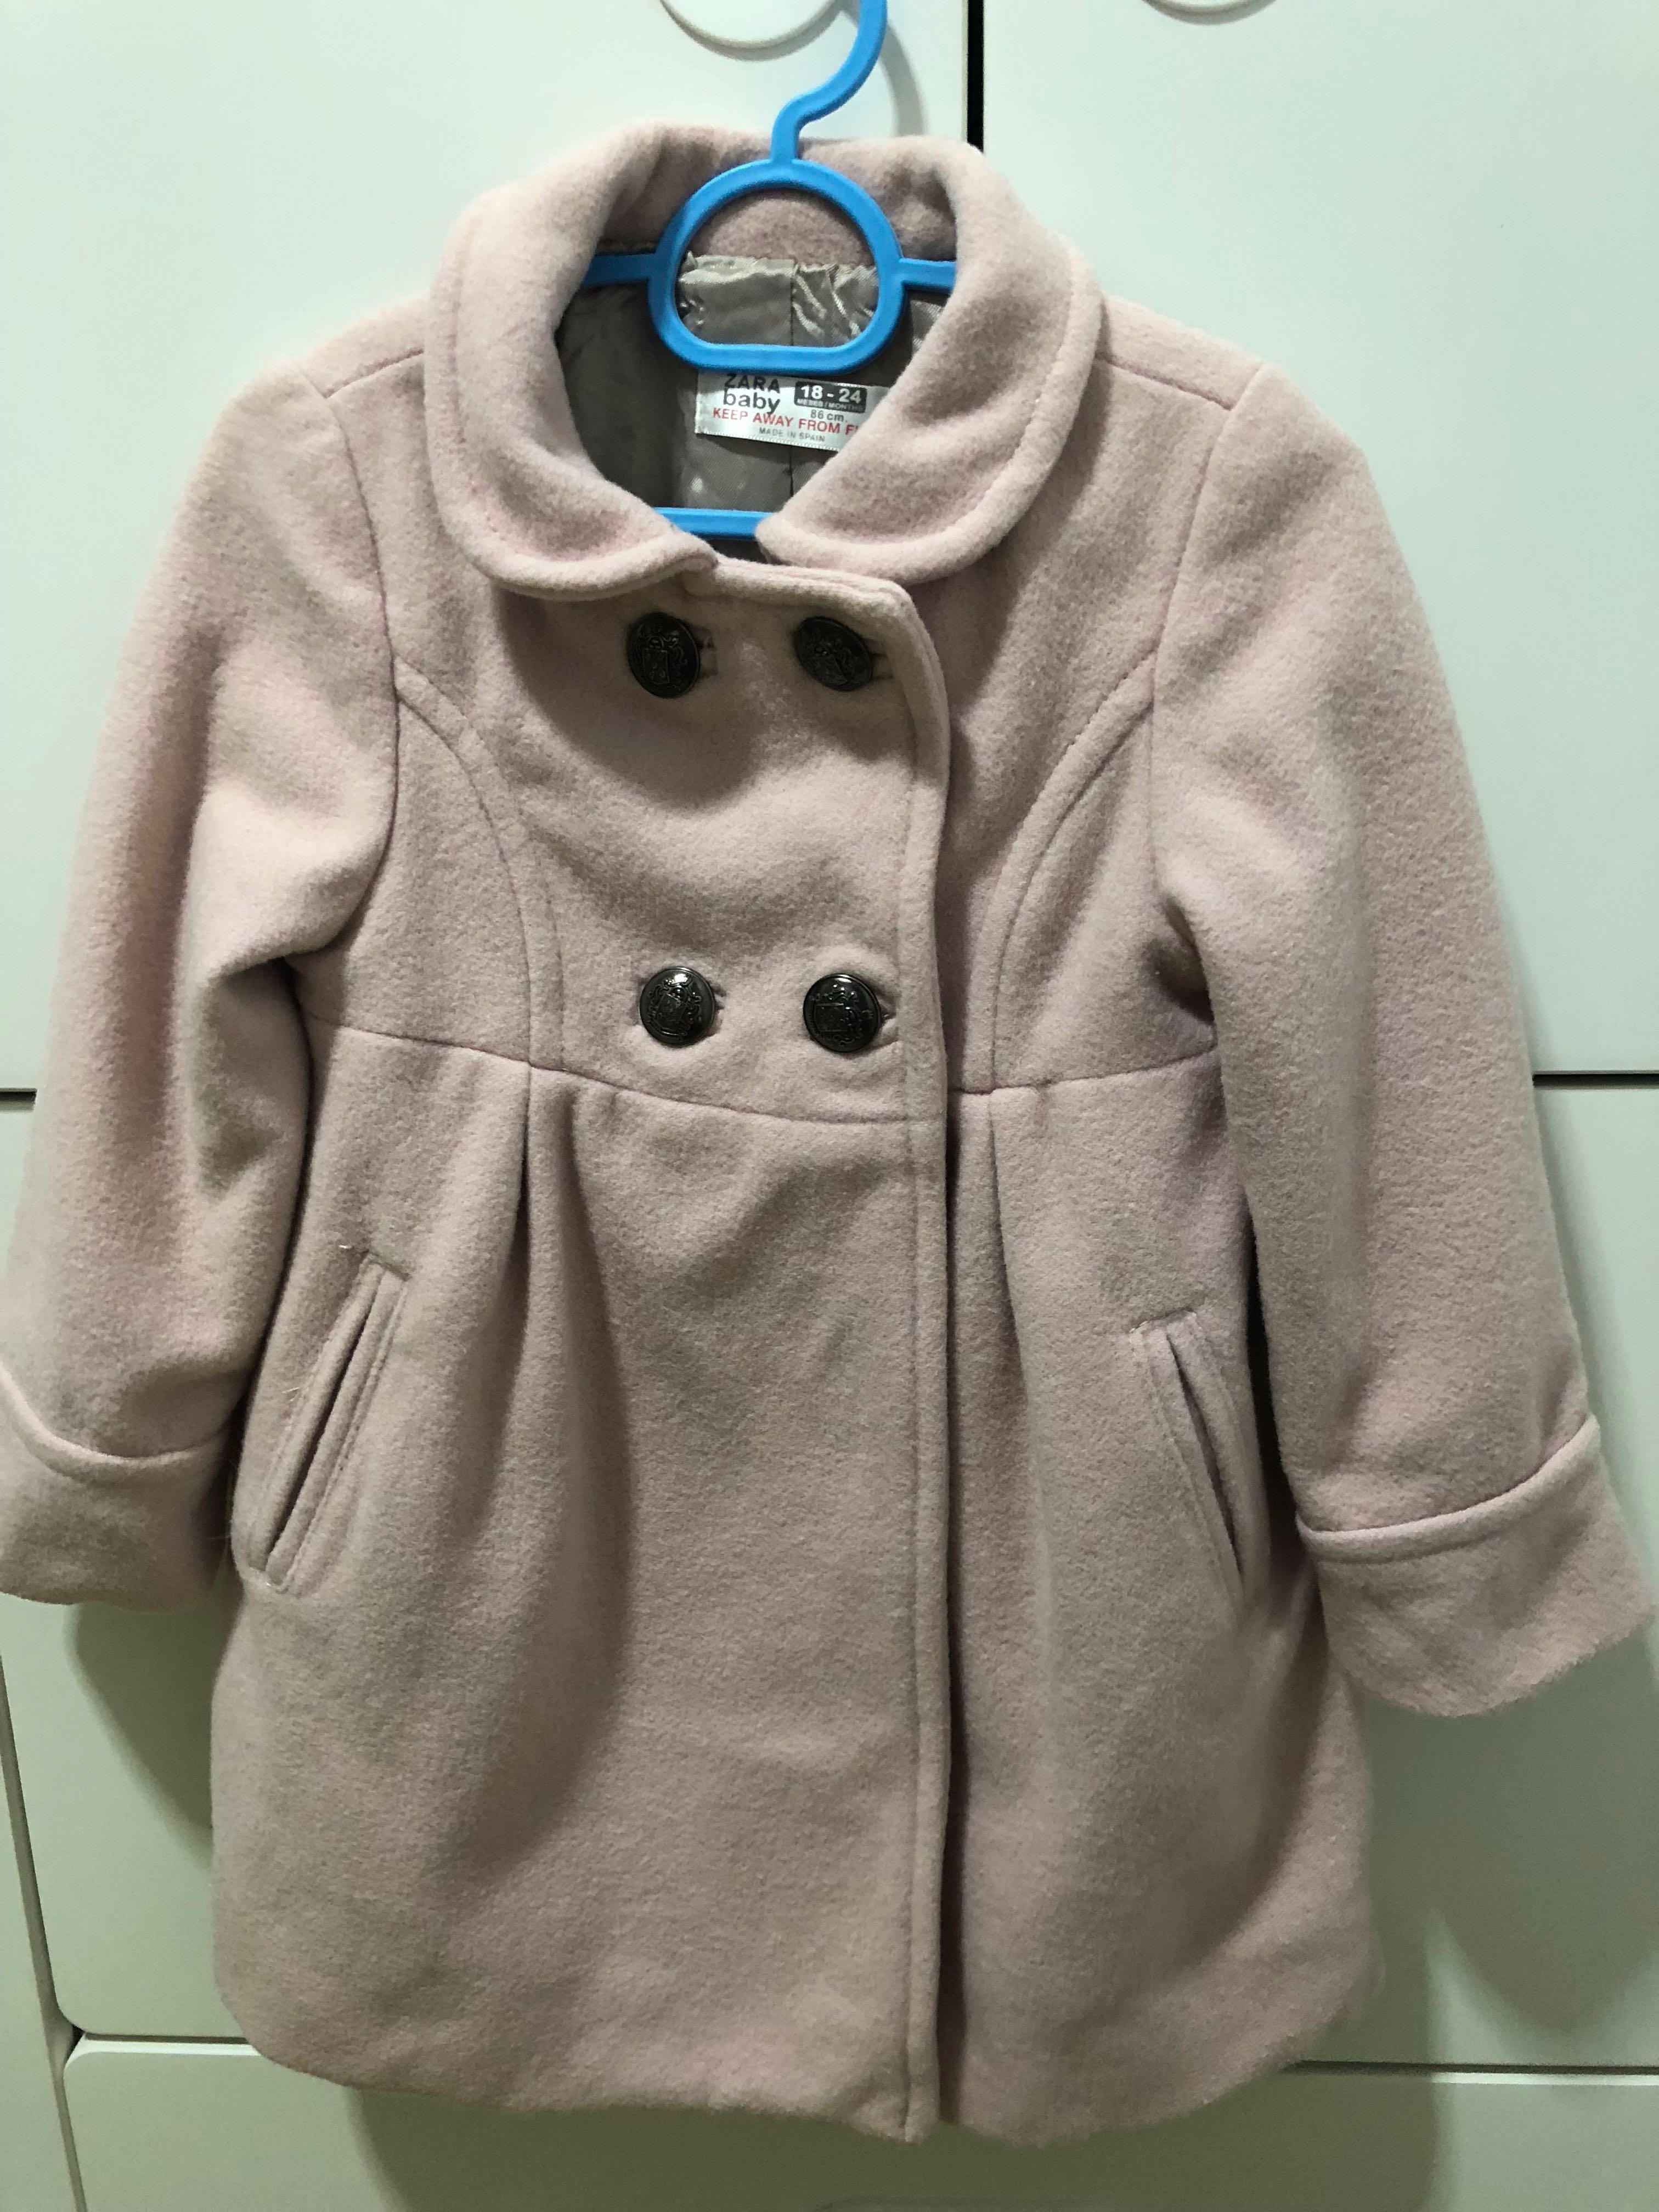 a9d922eb425b Zara baby girl winter jacket coat (18-24 months)